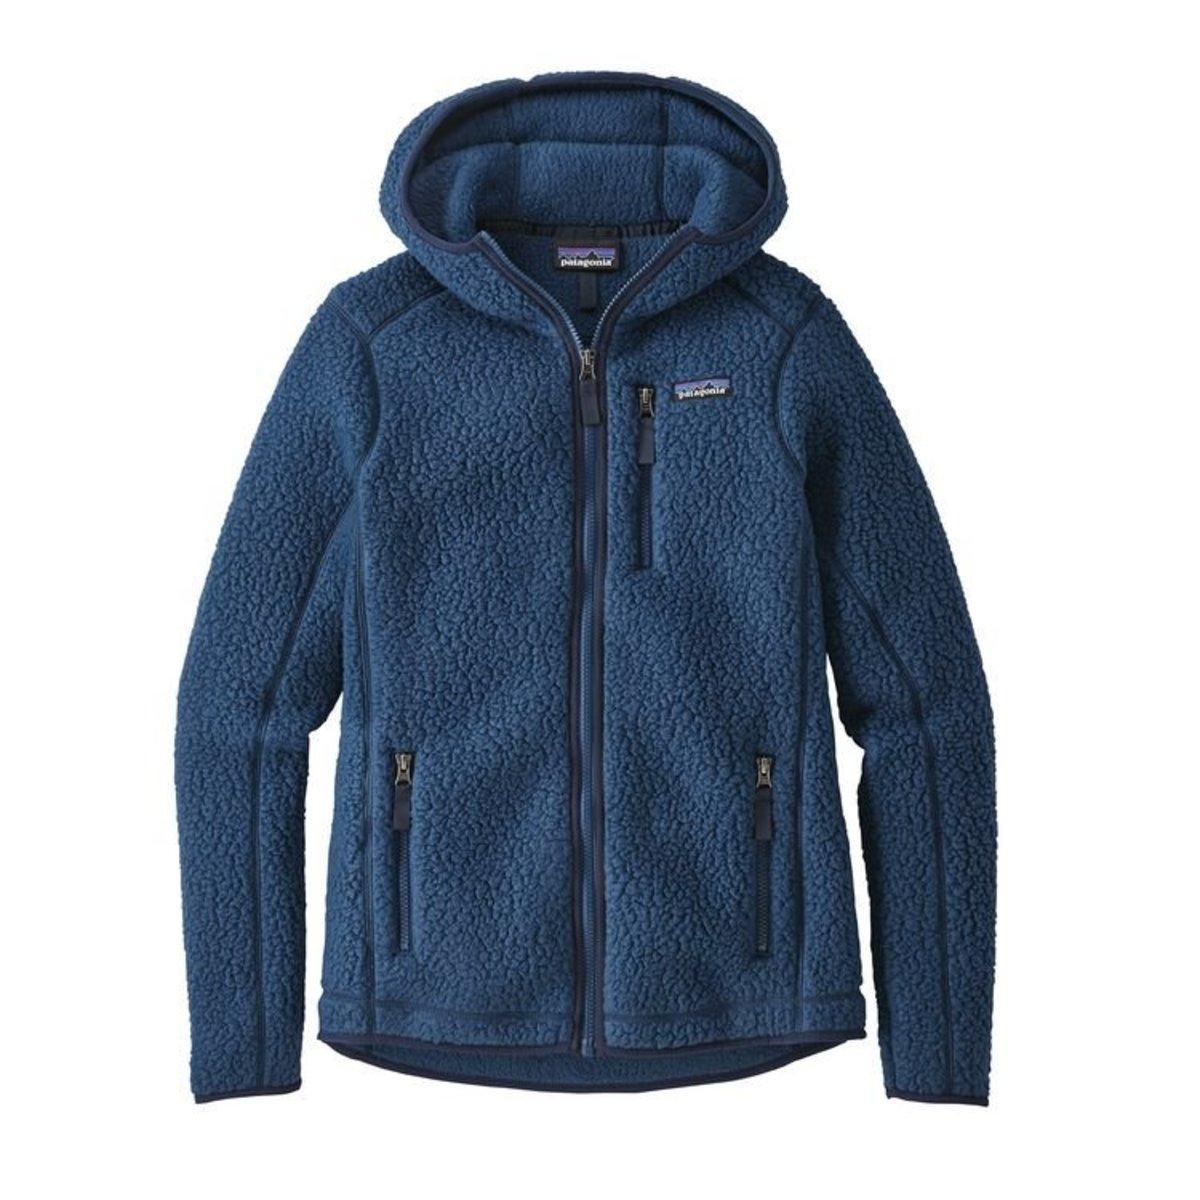 b9a1cd6609d9 Lyst - Patagonia Retro Pile Fleece Hoody in Blue